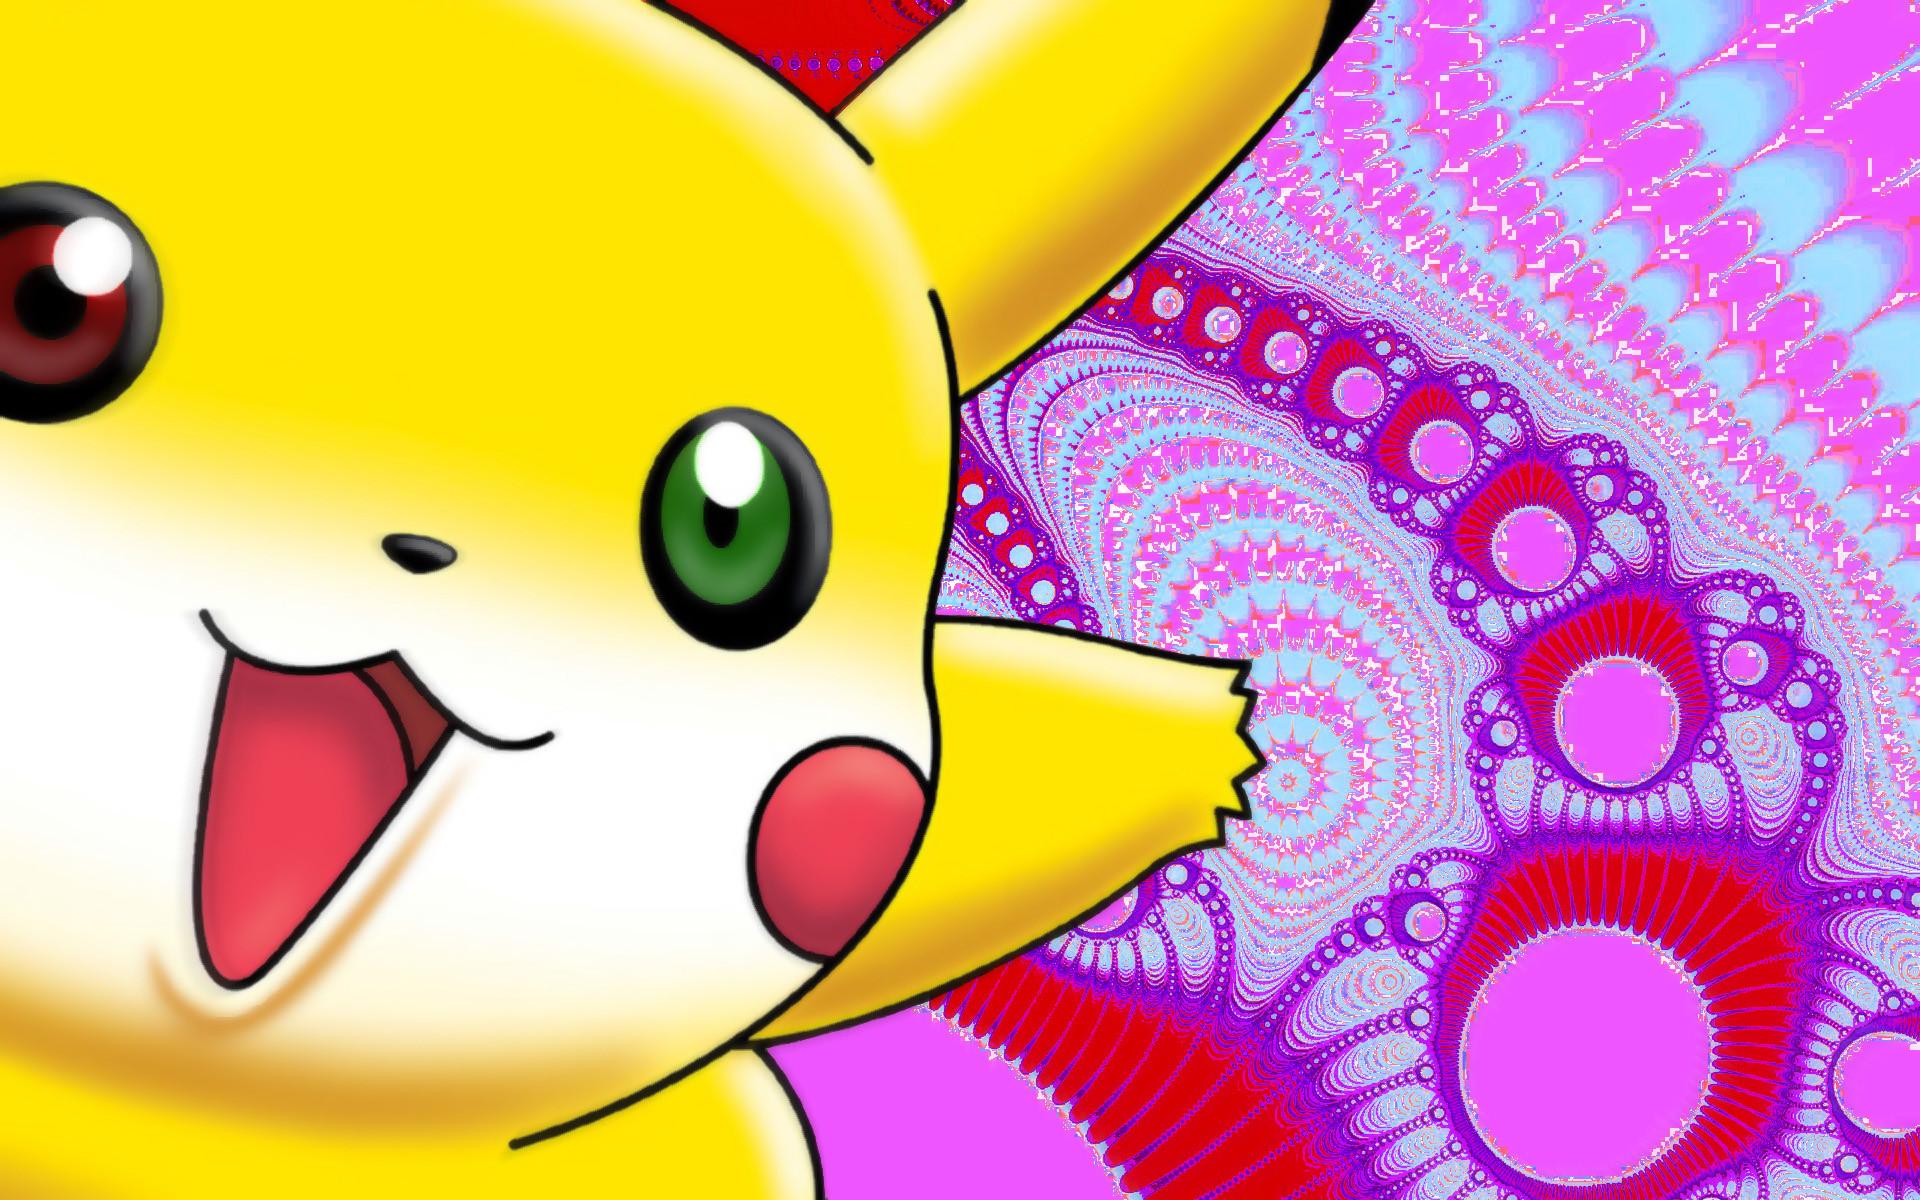 … Pokemon Pikachu fractals funny wallpaper …